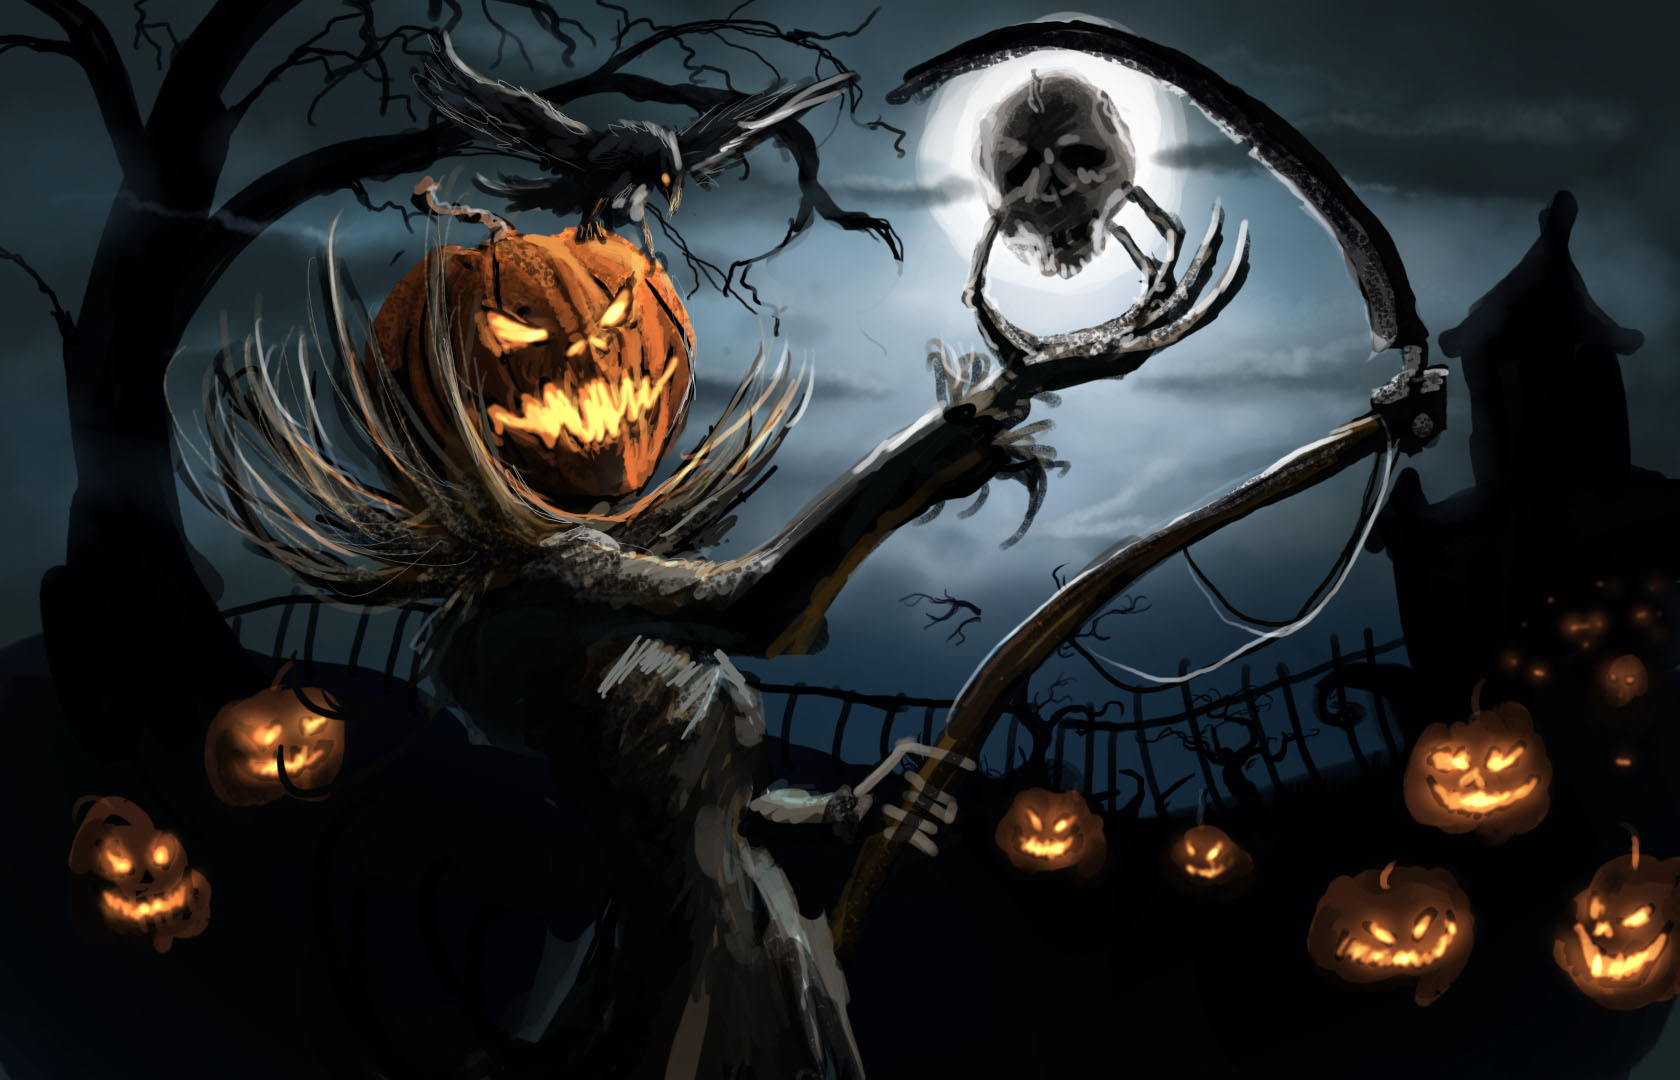 Halloween Scary Wallpaper - WallpaperSafari